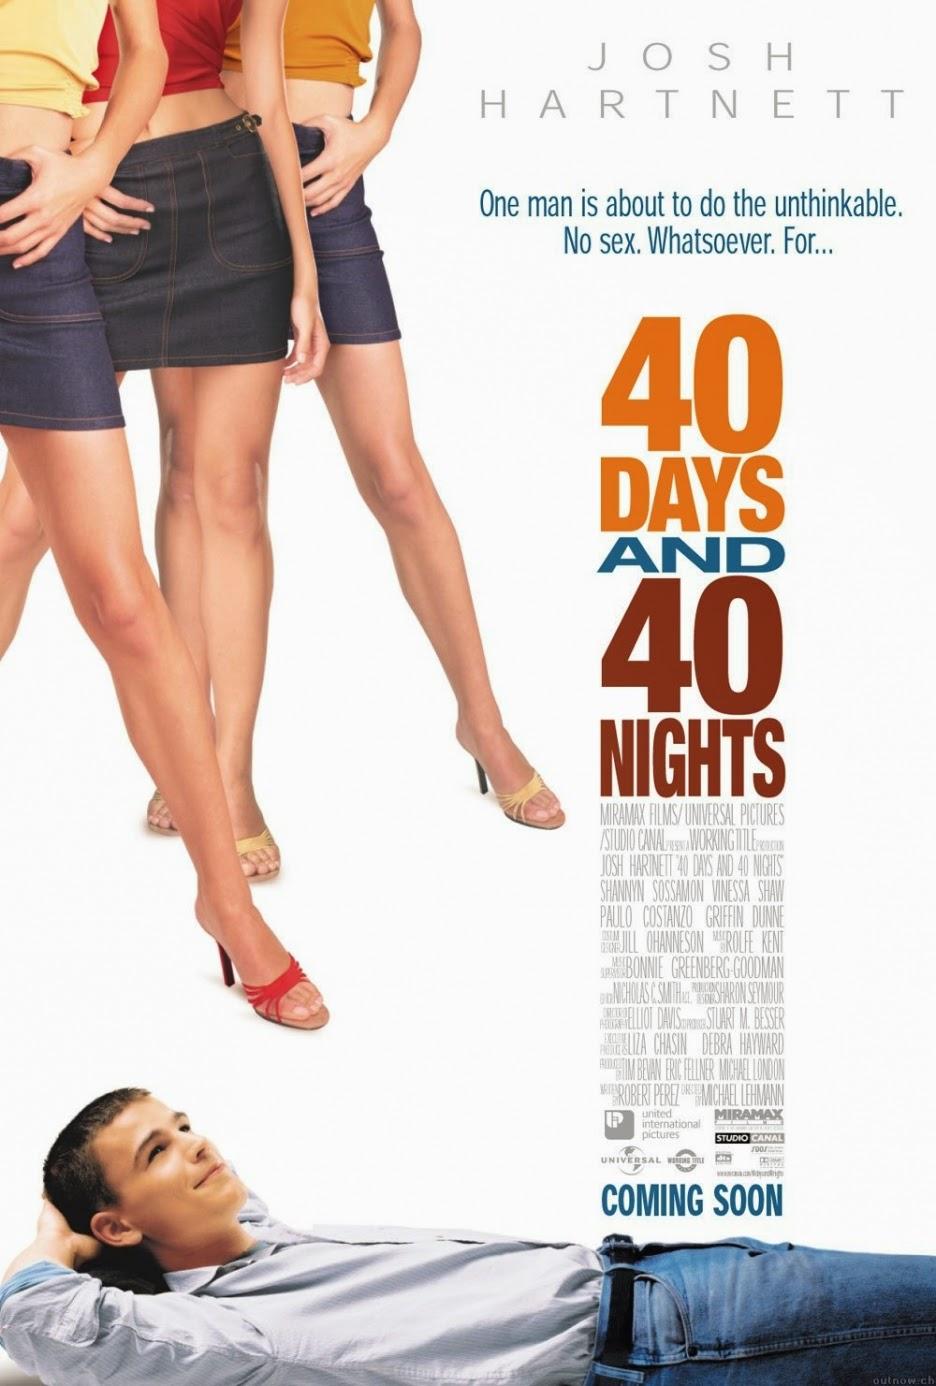 40 DAYS AND 40 NIGHTS 40 วัน อั้นแอ้ม ไม่อั้นรัก HD 2002 FULL HD พากย์ไทย มาสเตอร์